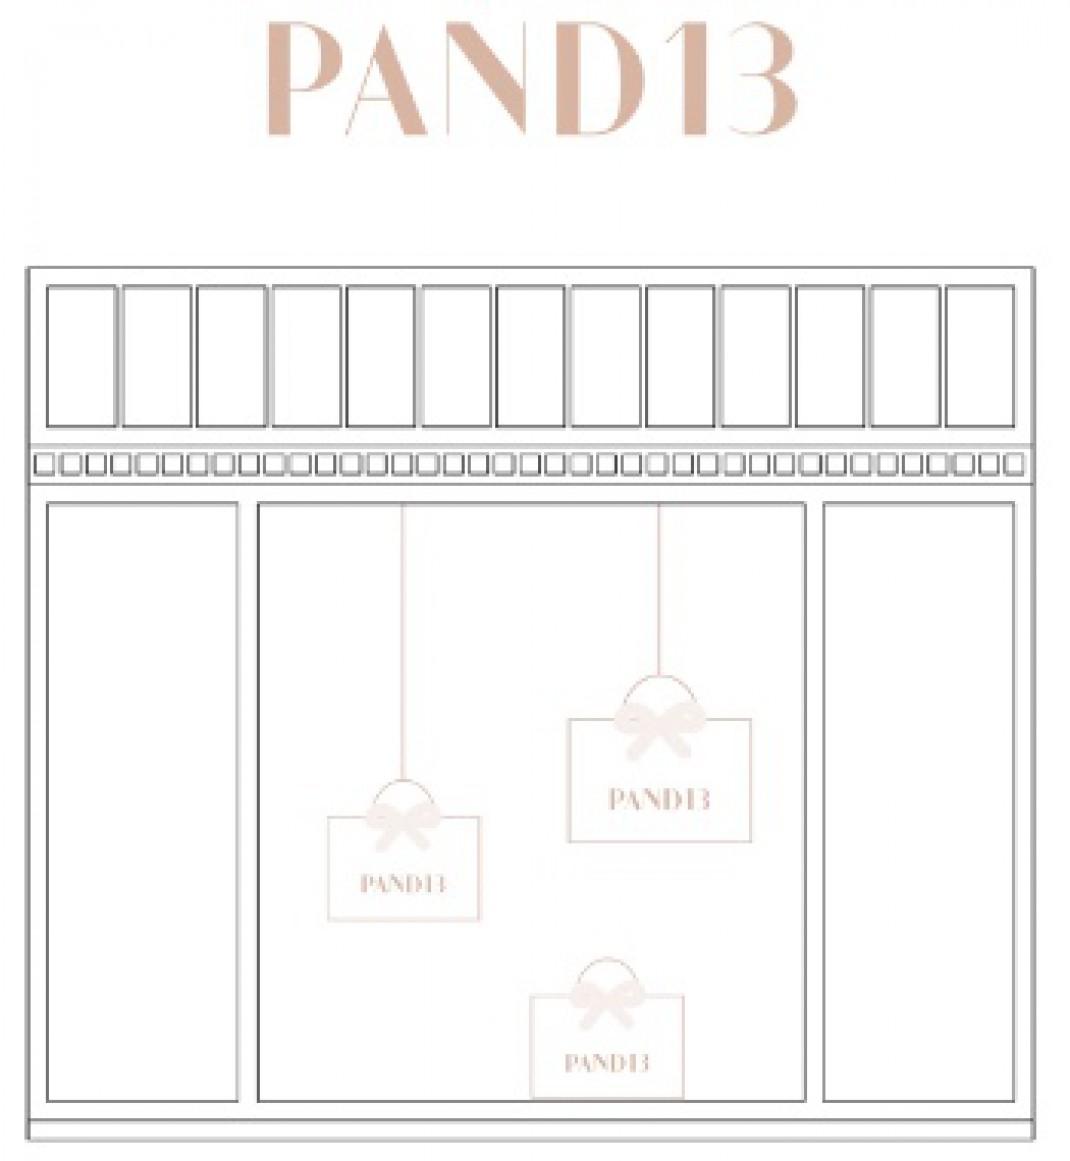 PAND13 News